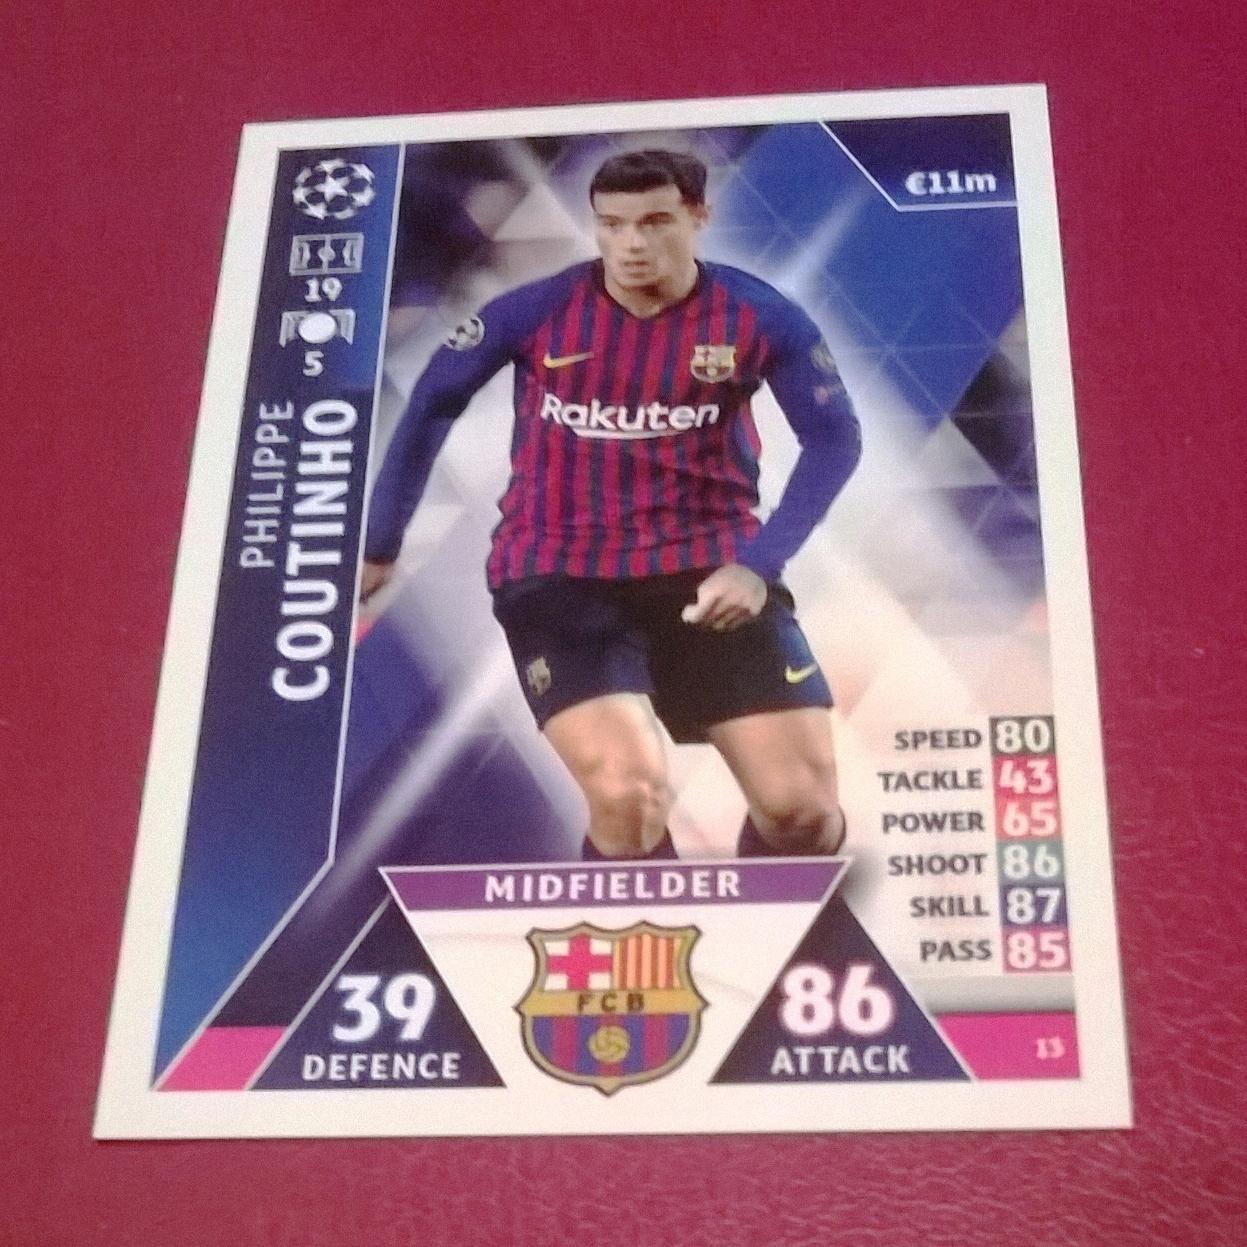 aa7ac0e81 Match Attax 18/19 - Coutinho (FC Barcelona) - 7589964308 - oficjalne ...